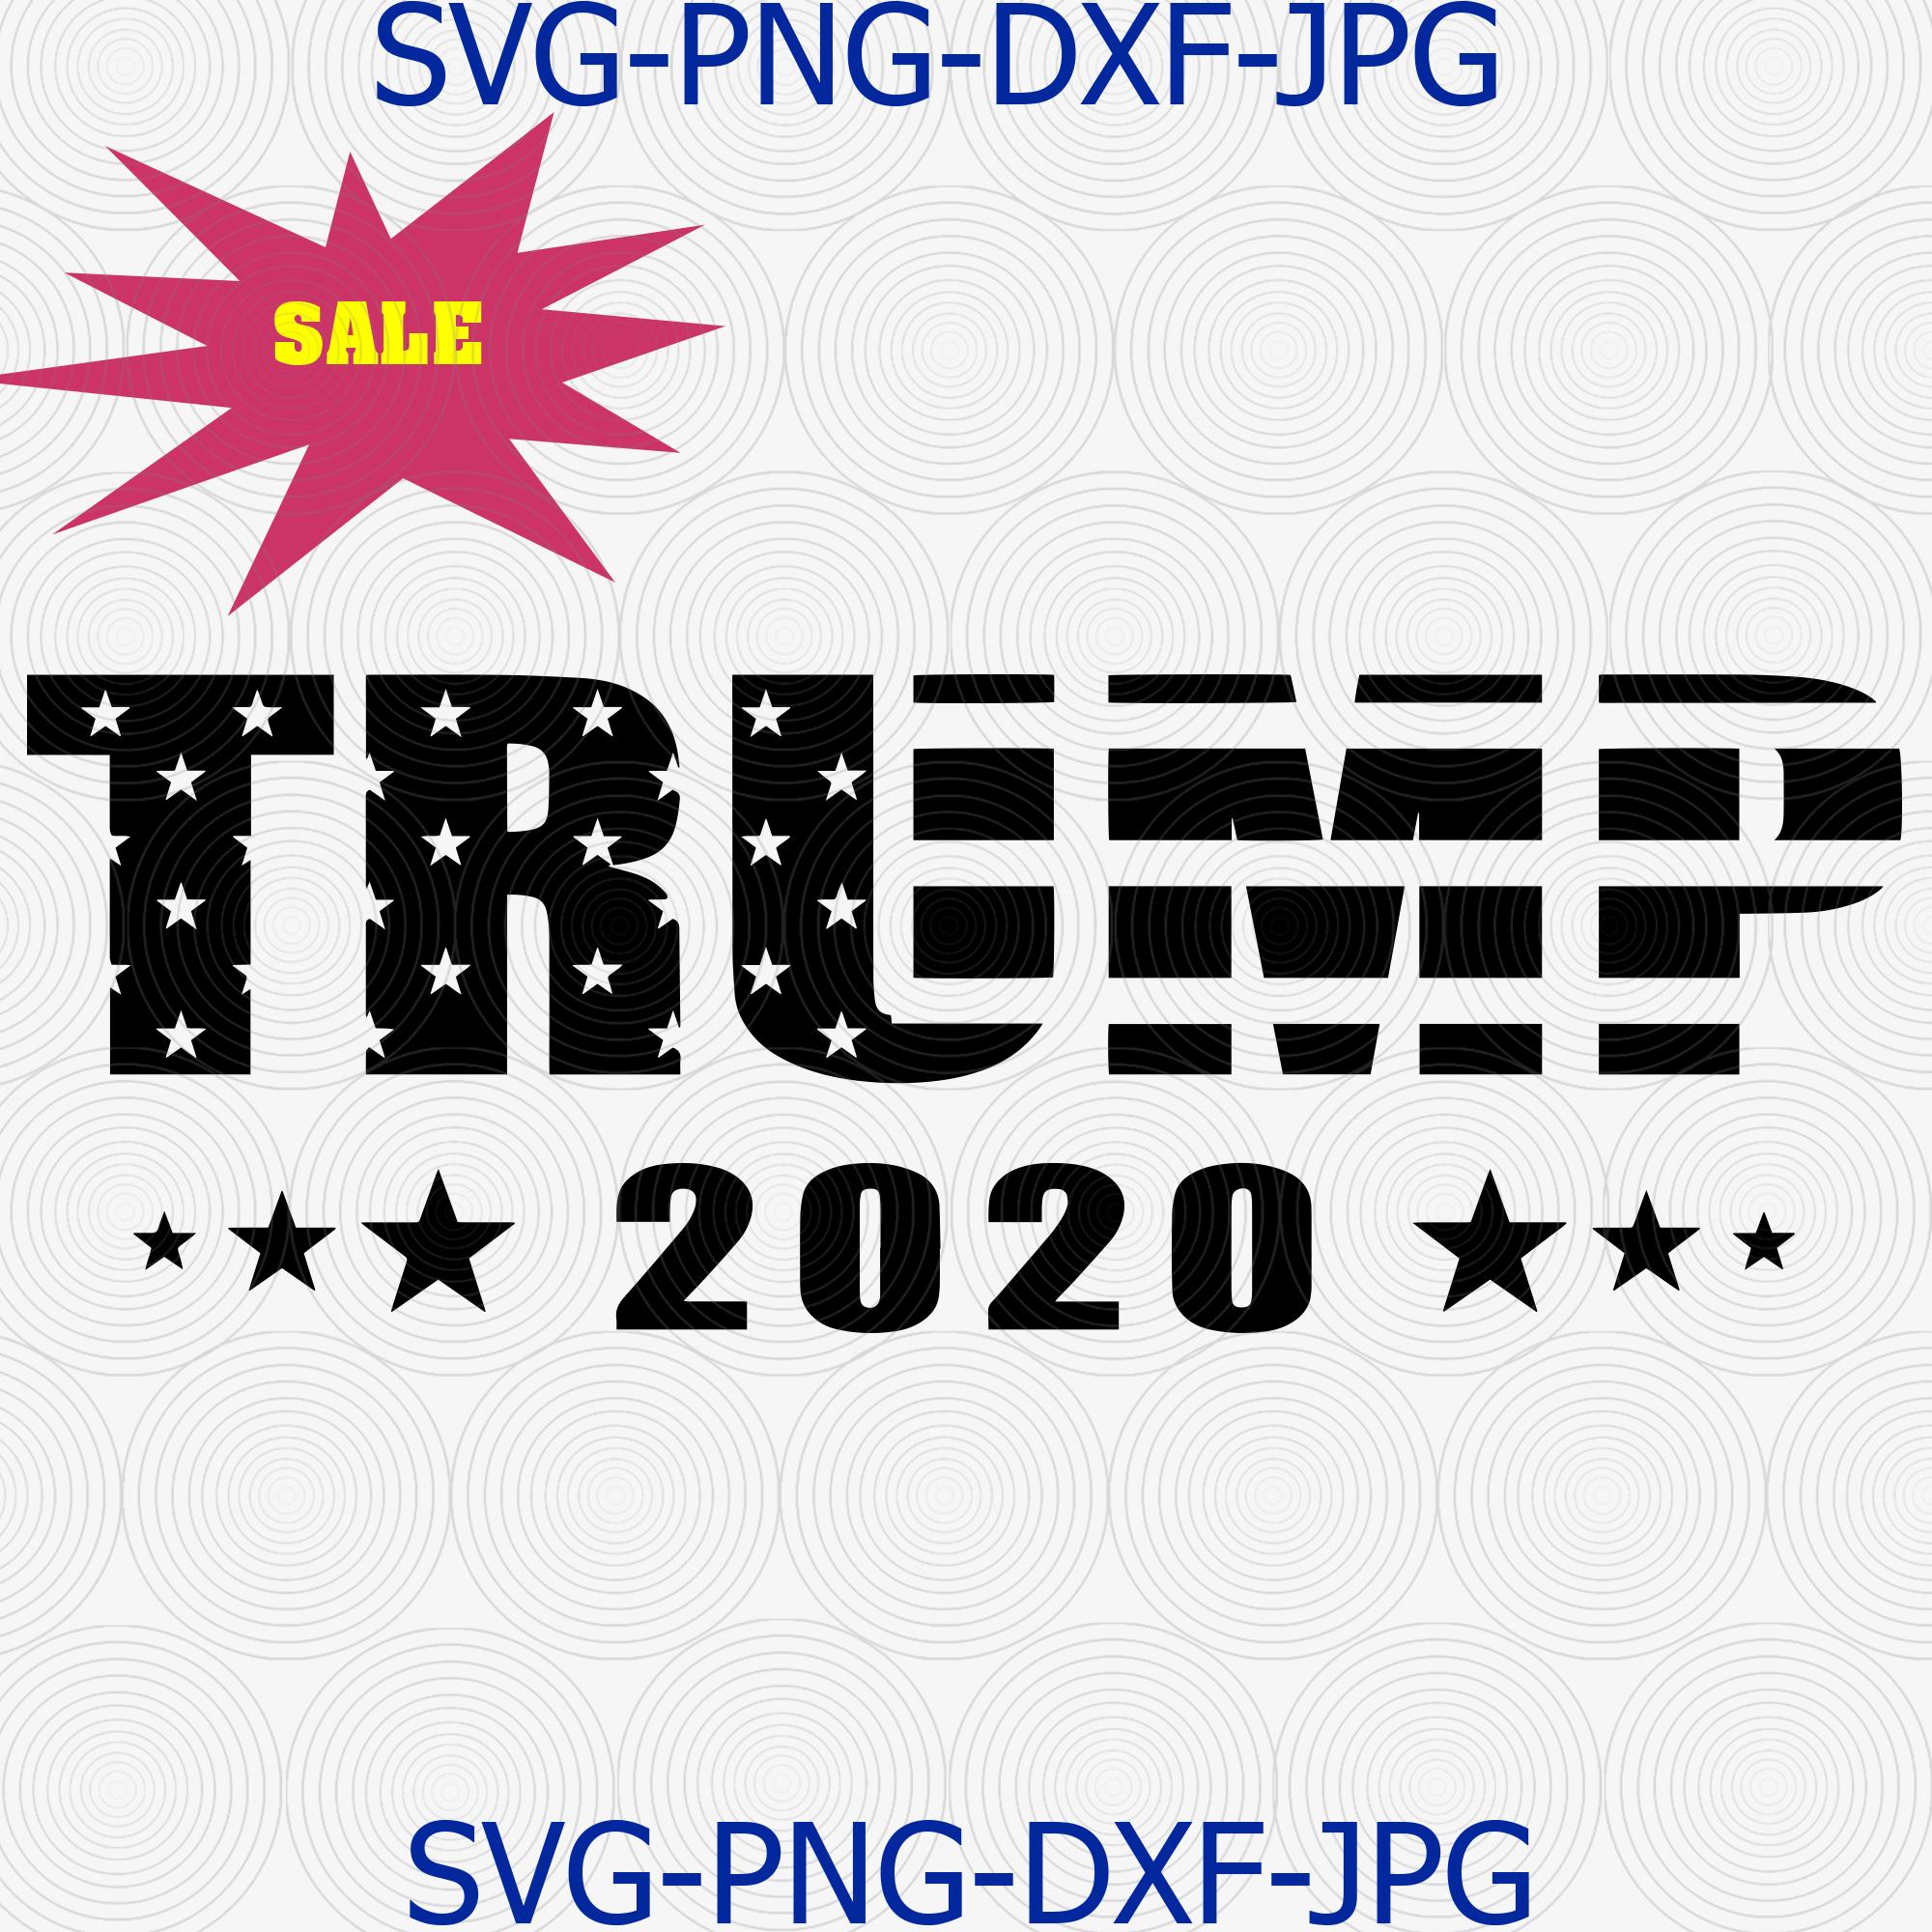 Trump 2020 Svg Make America Great Again By Digital4u On Zibbet